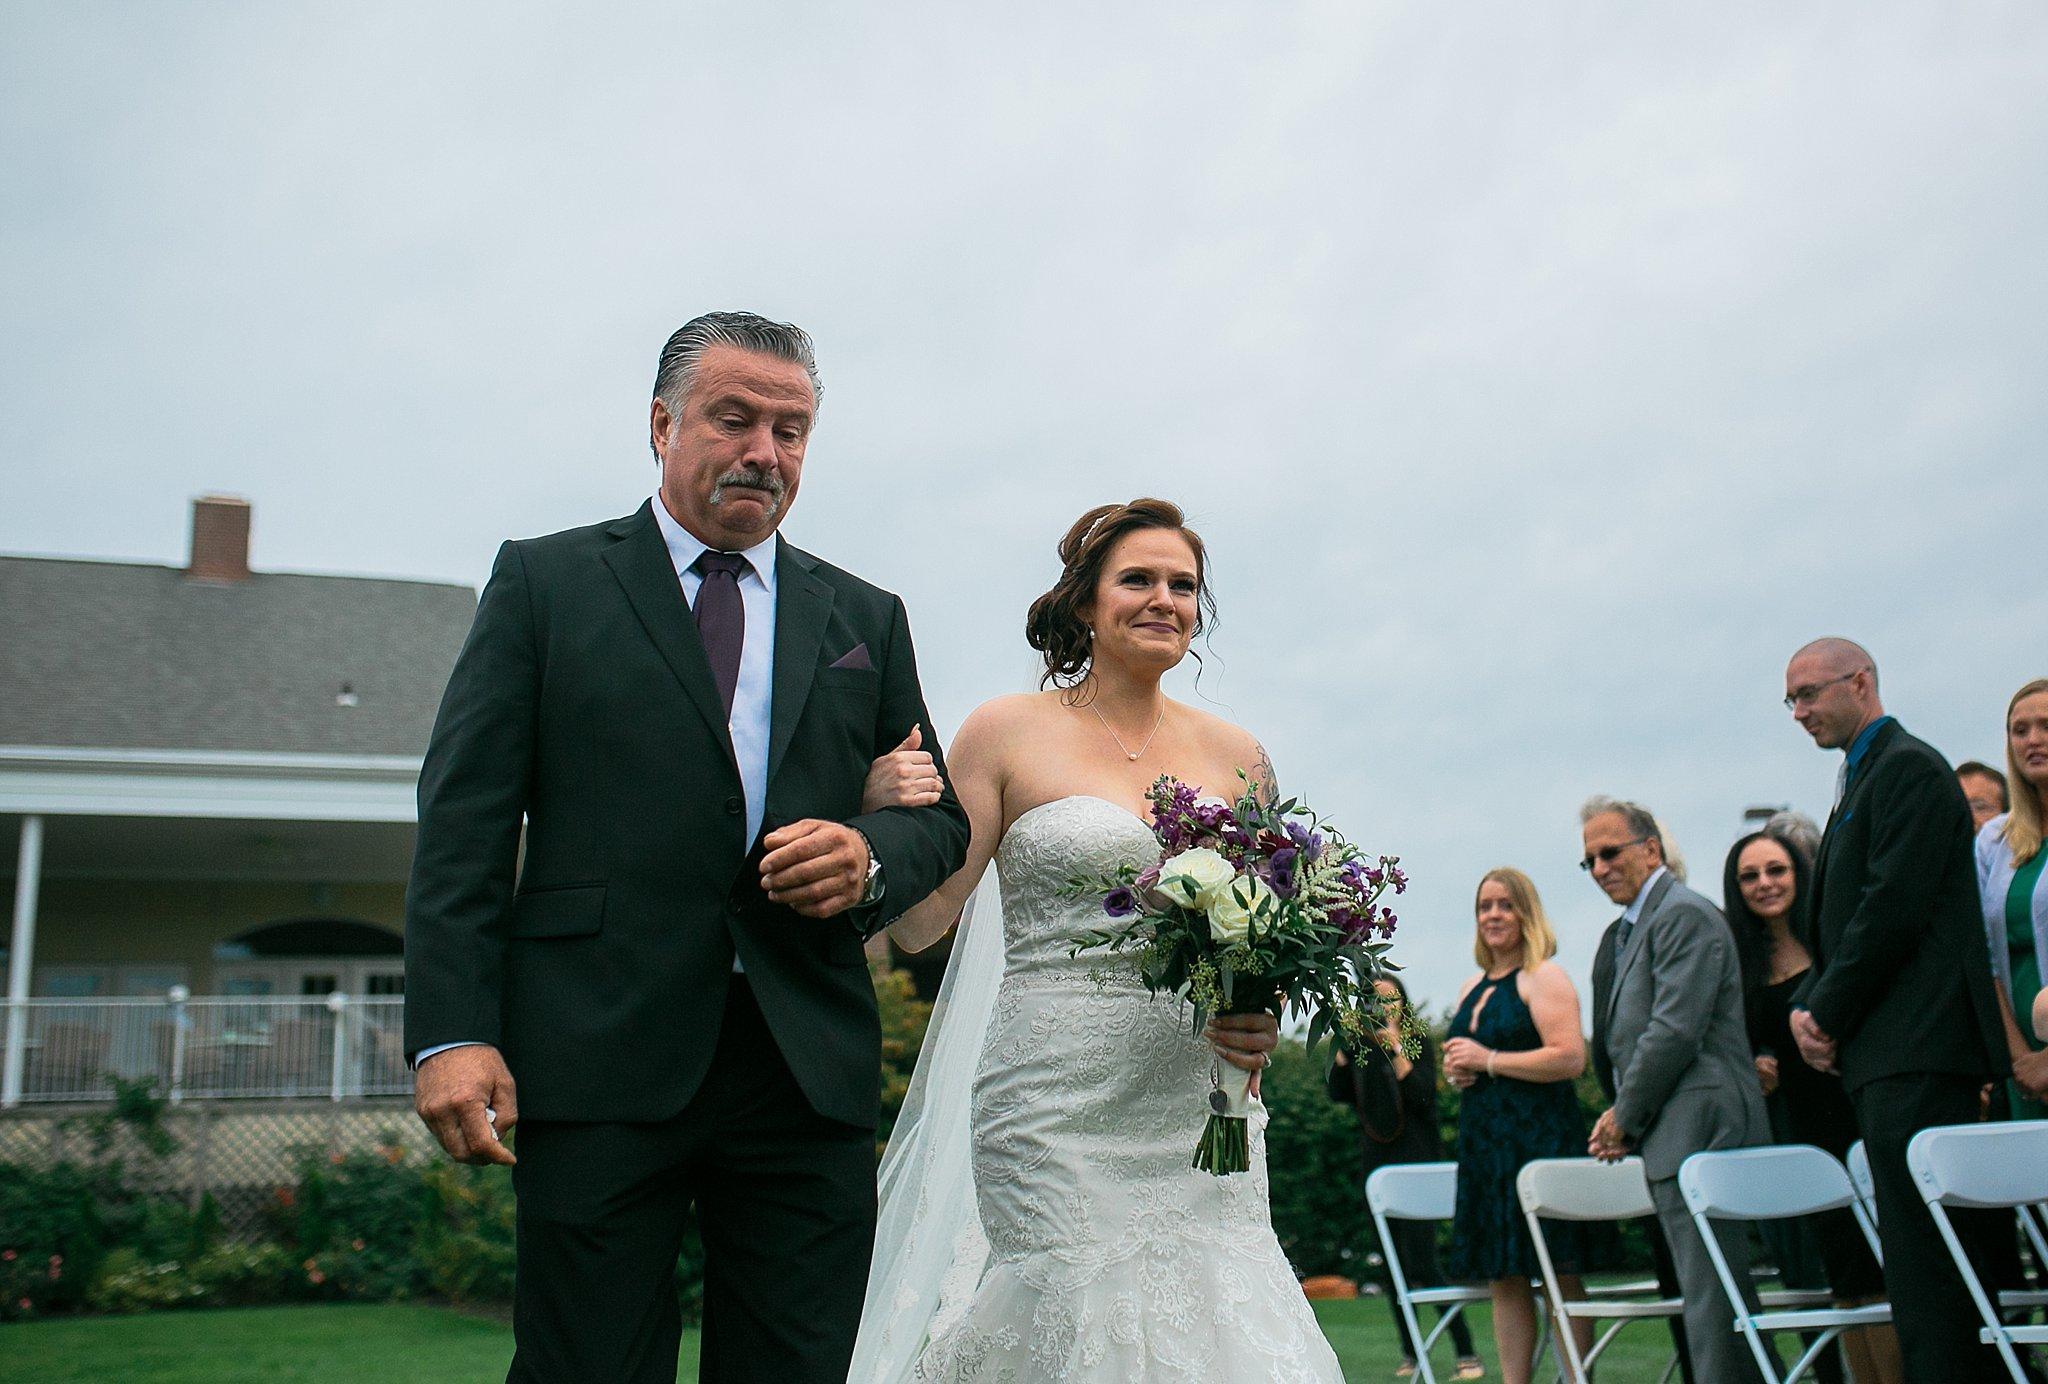 Links at Unionvale Wedding Lagrangeville Wedding Hudson Valley Wedding Photographer Sweet Alice Photography26.jpg